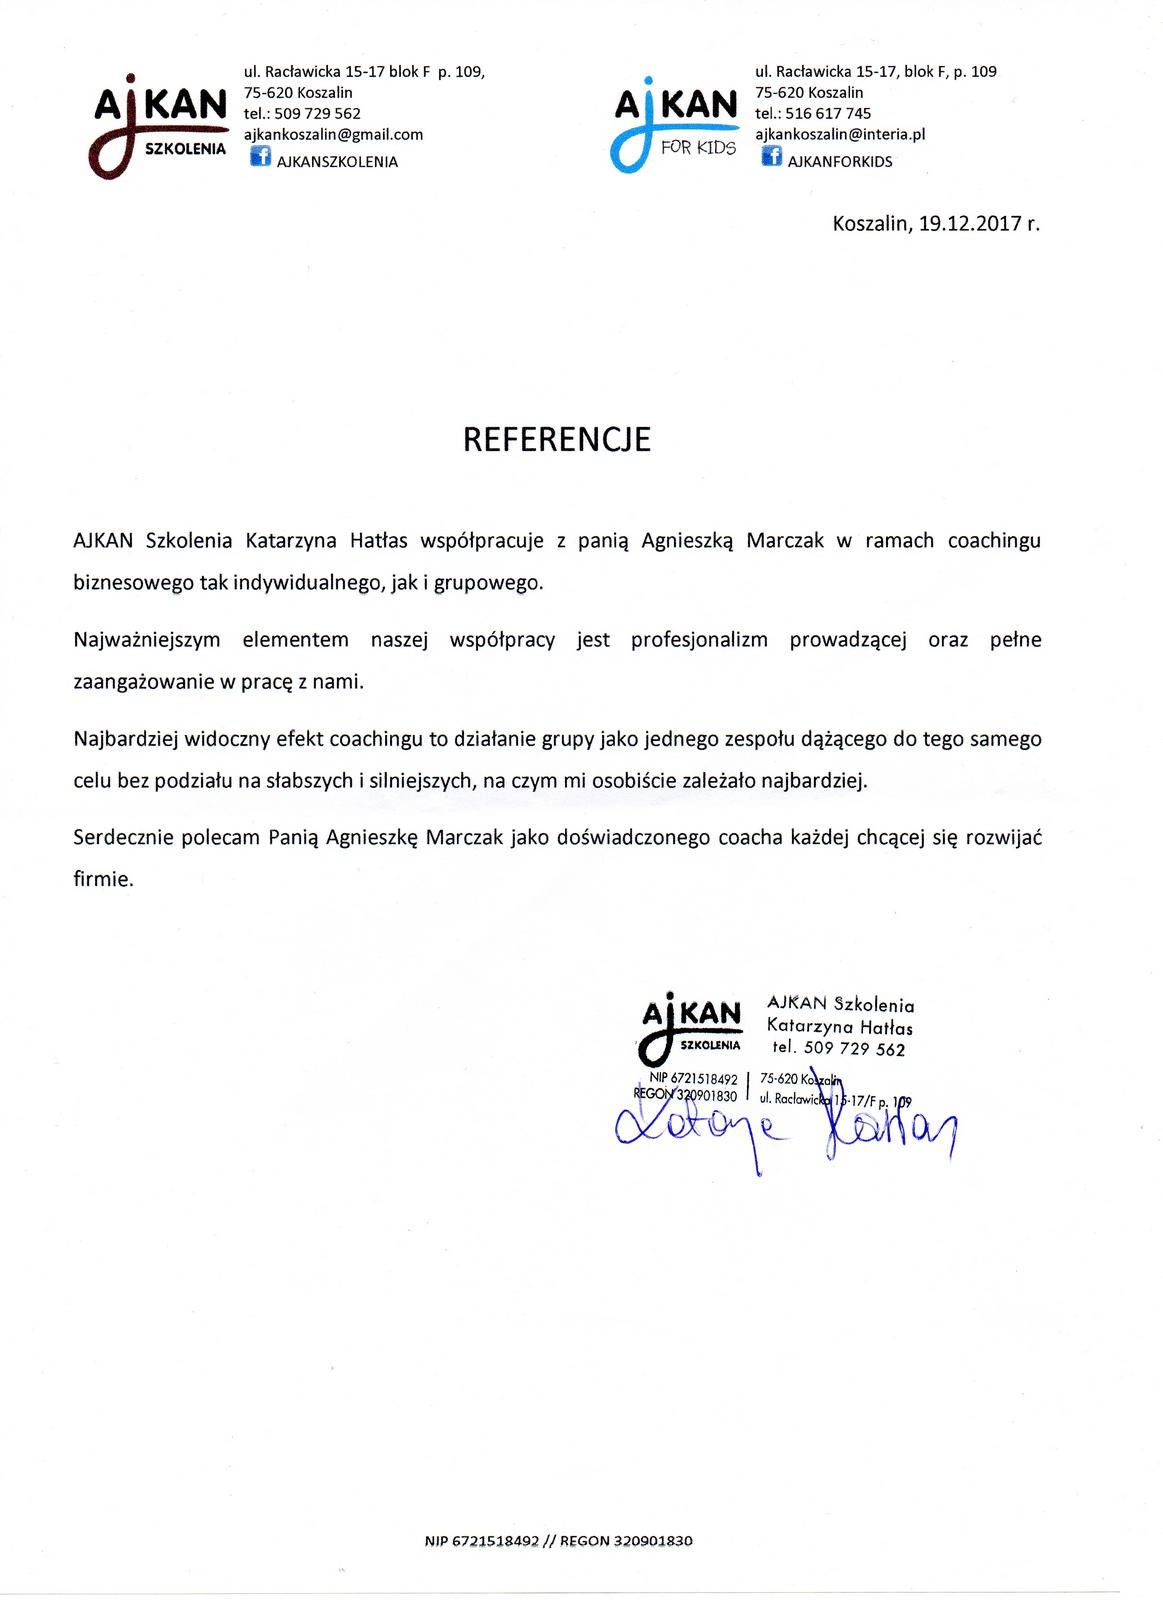 Referencje Ajkan